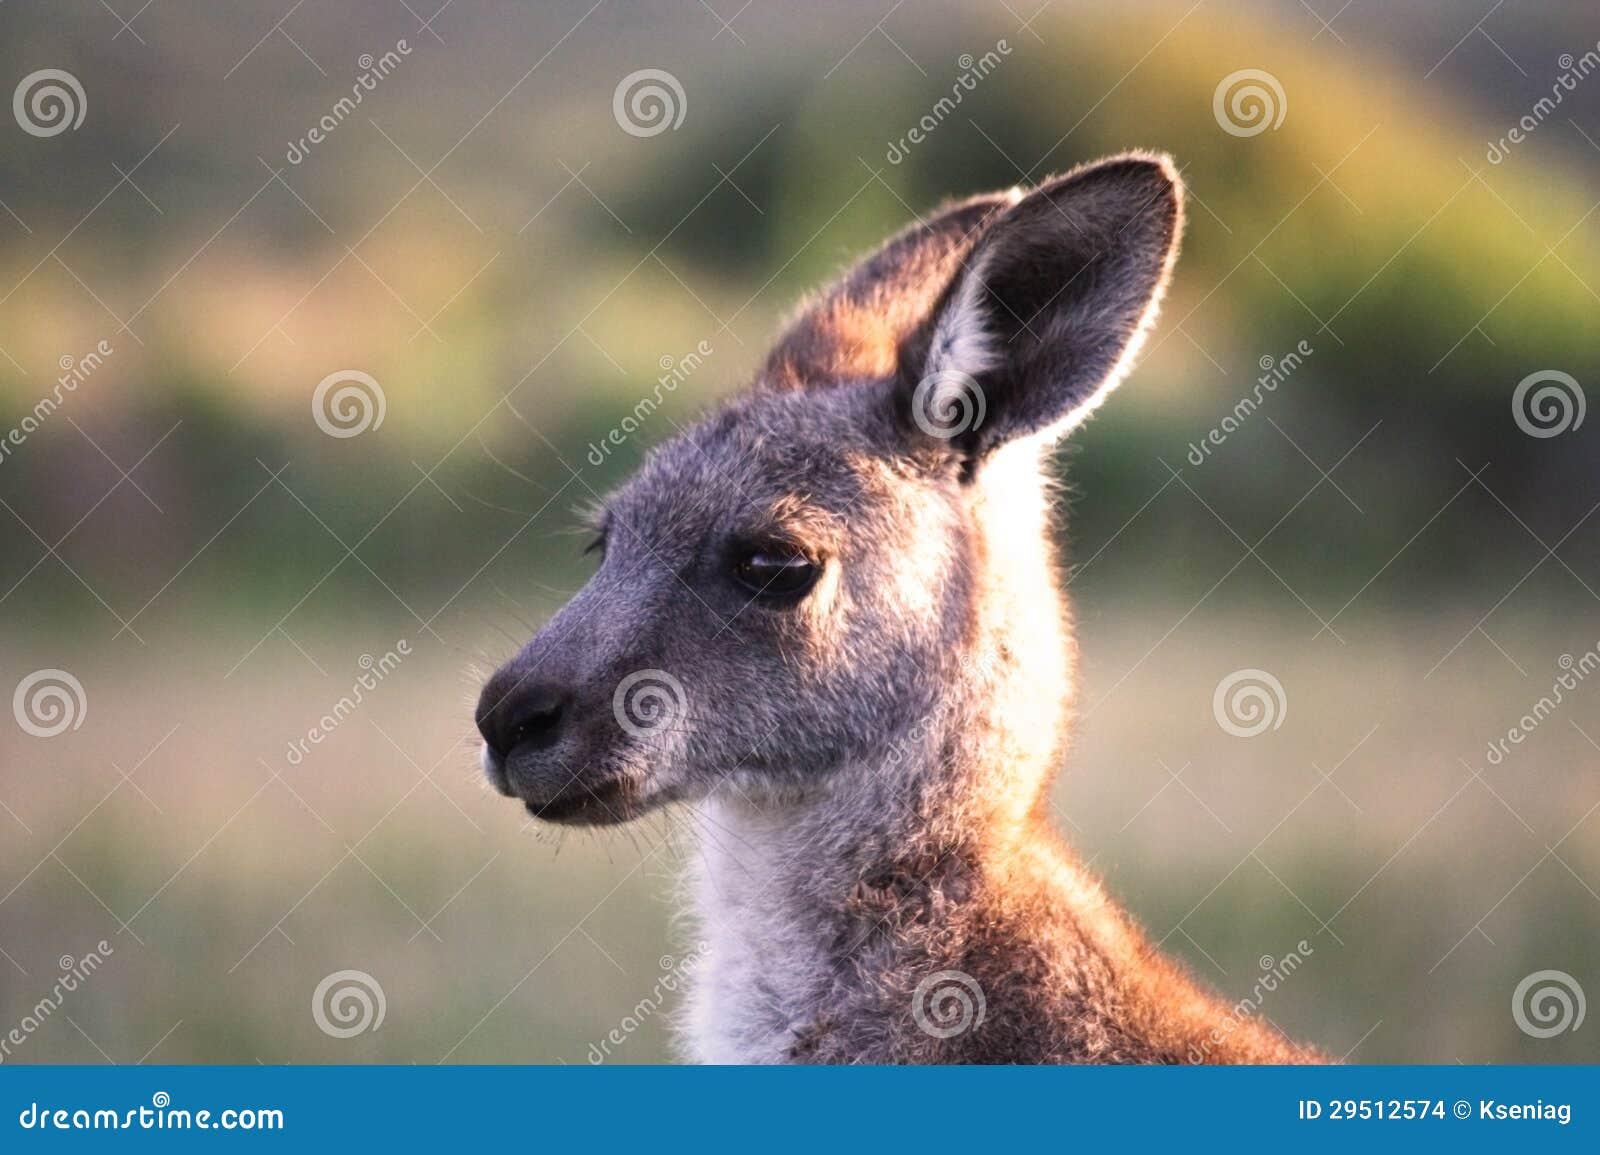 Australië. Het voorgebergte van Wilsons. Kangoeroe